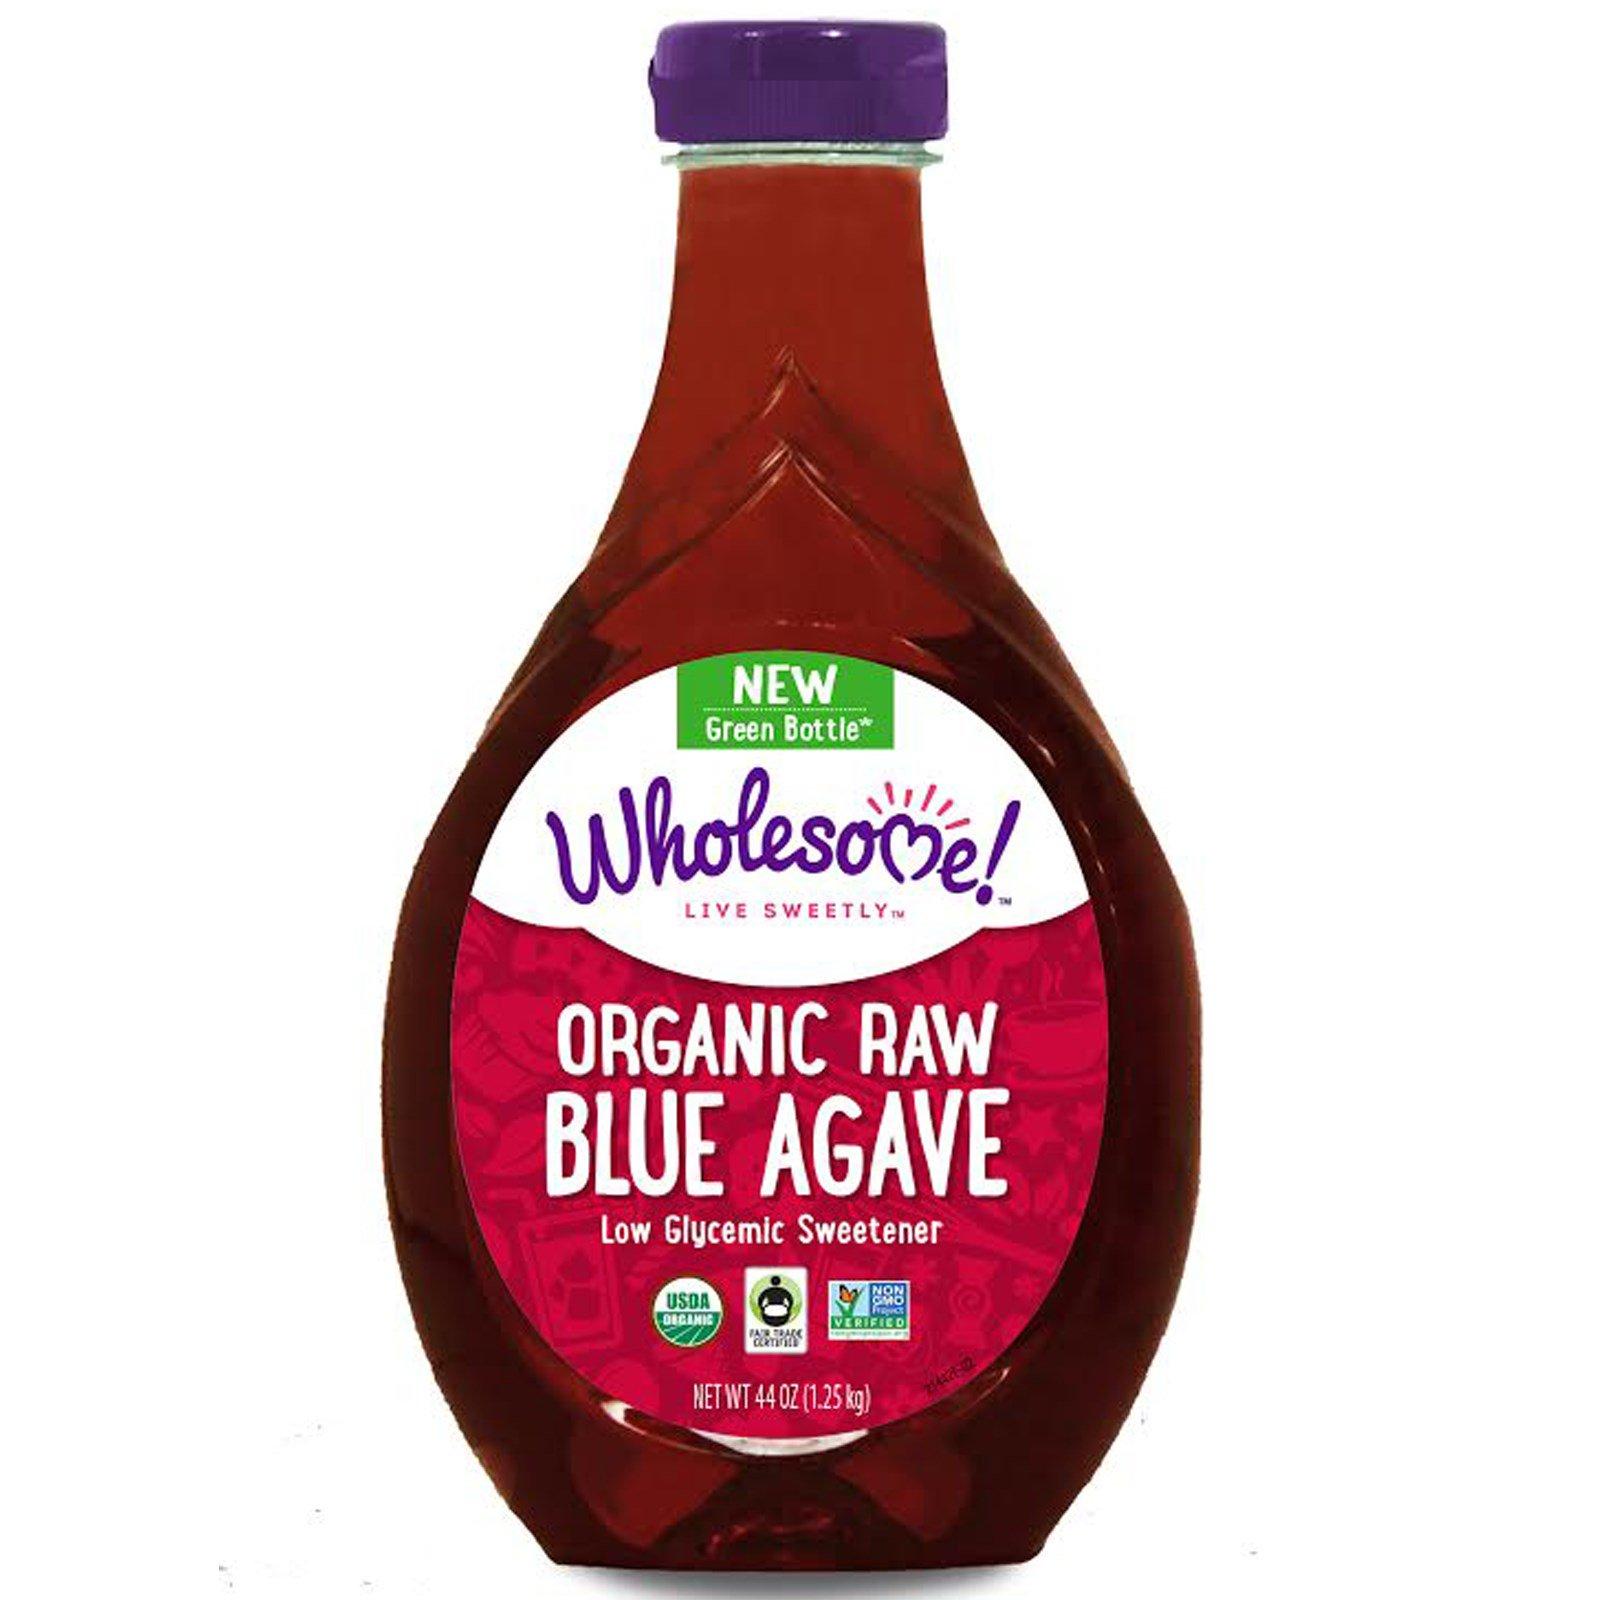 Wholesome Sweeteners, Inc., Сироп из натуральной голубой агавы, 1,25 кг